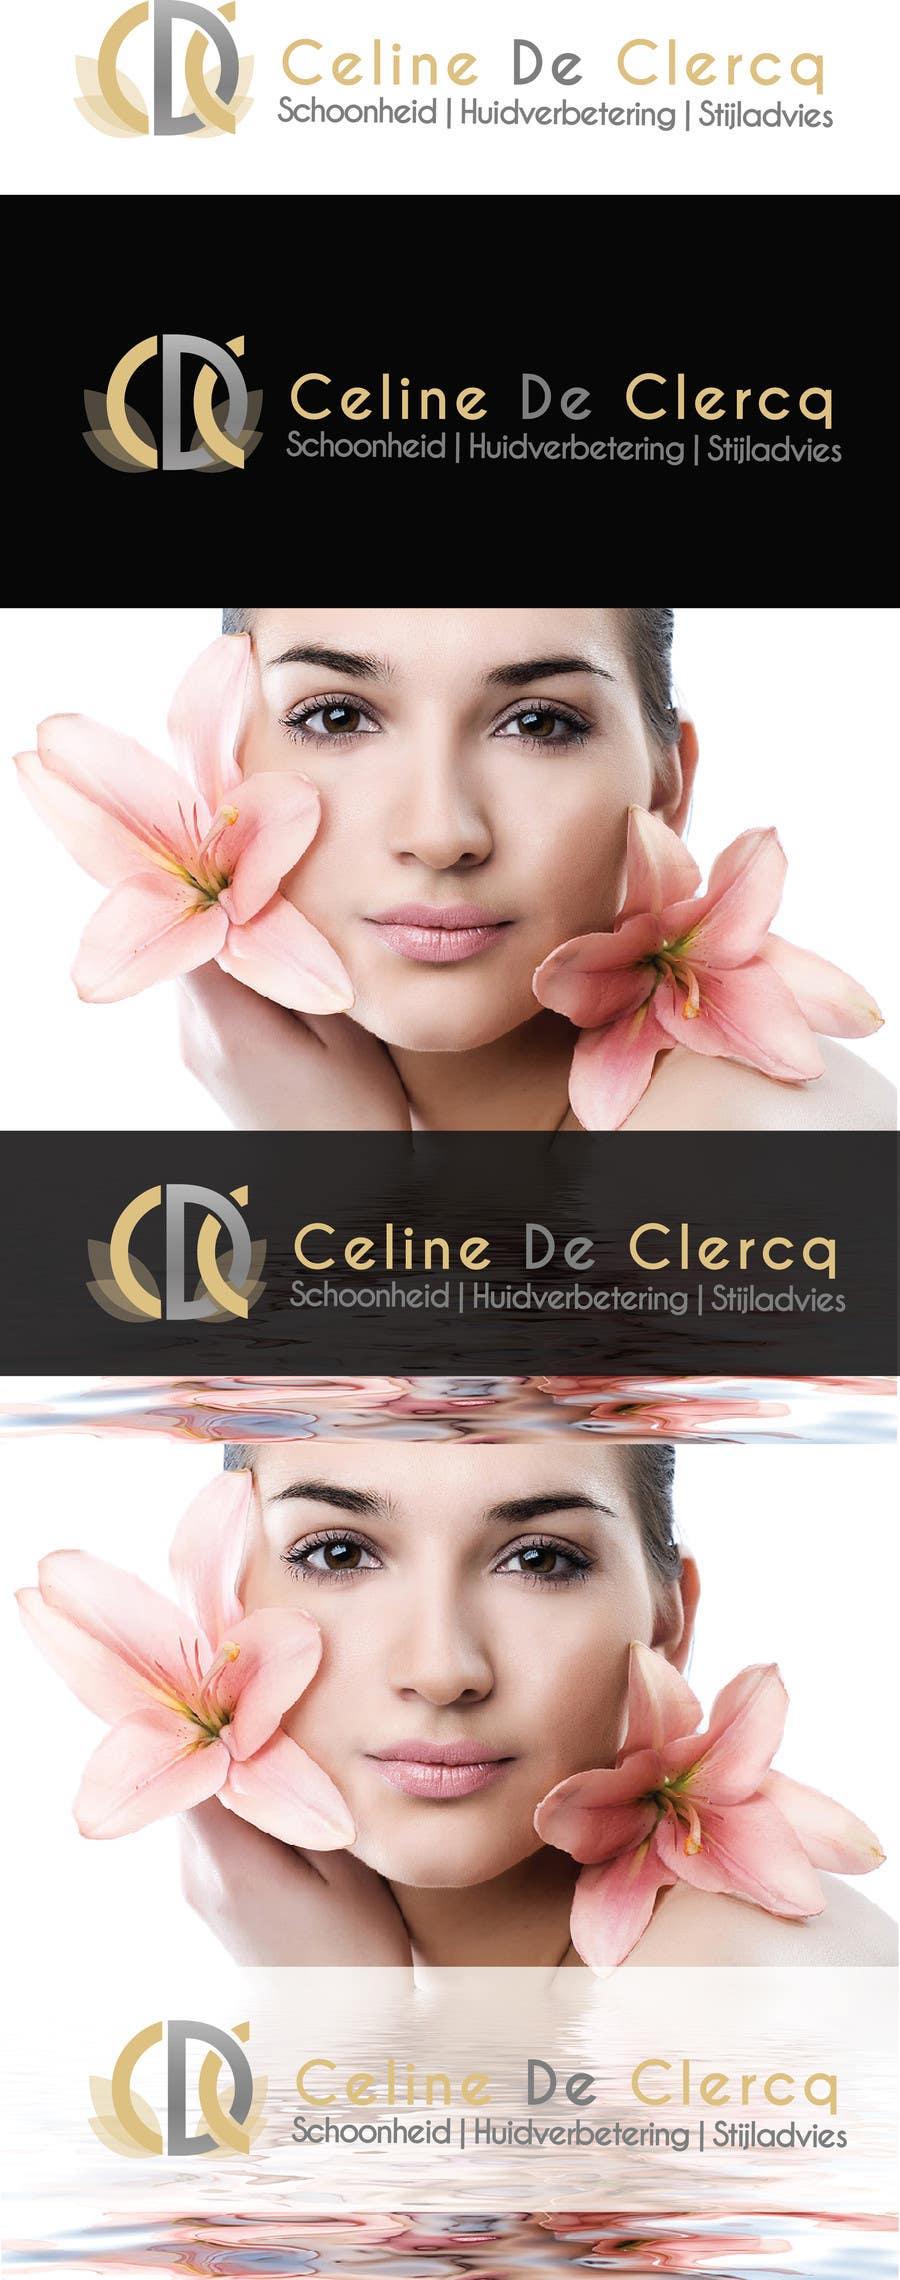 Bài tham dự cuộc thi #                                        82                                      cho                                         Design a Logo for a beauty salon